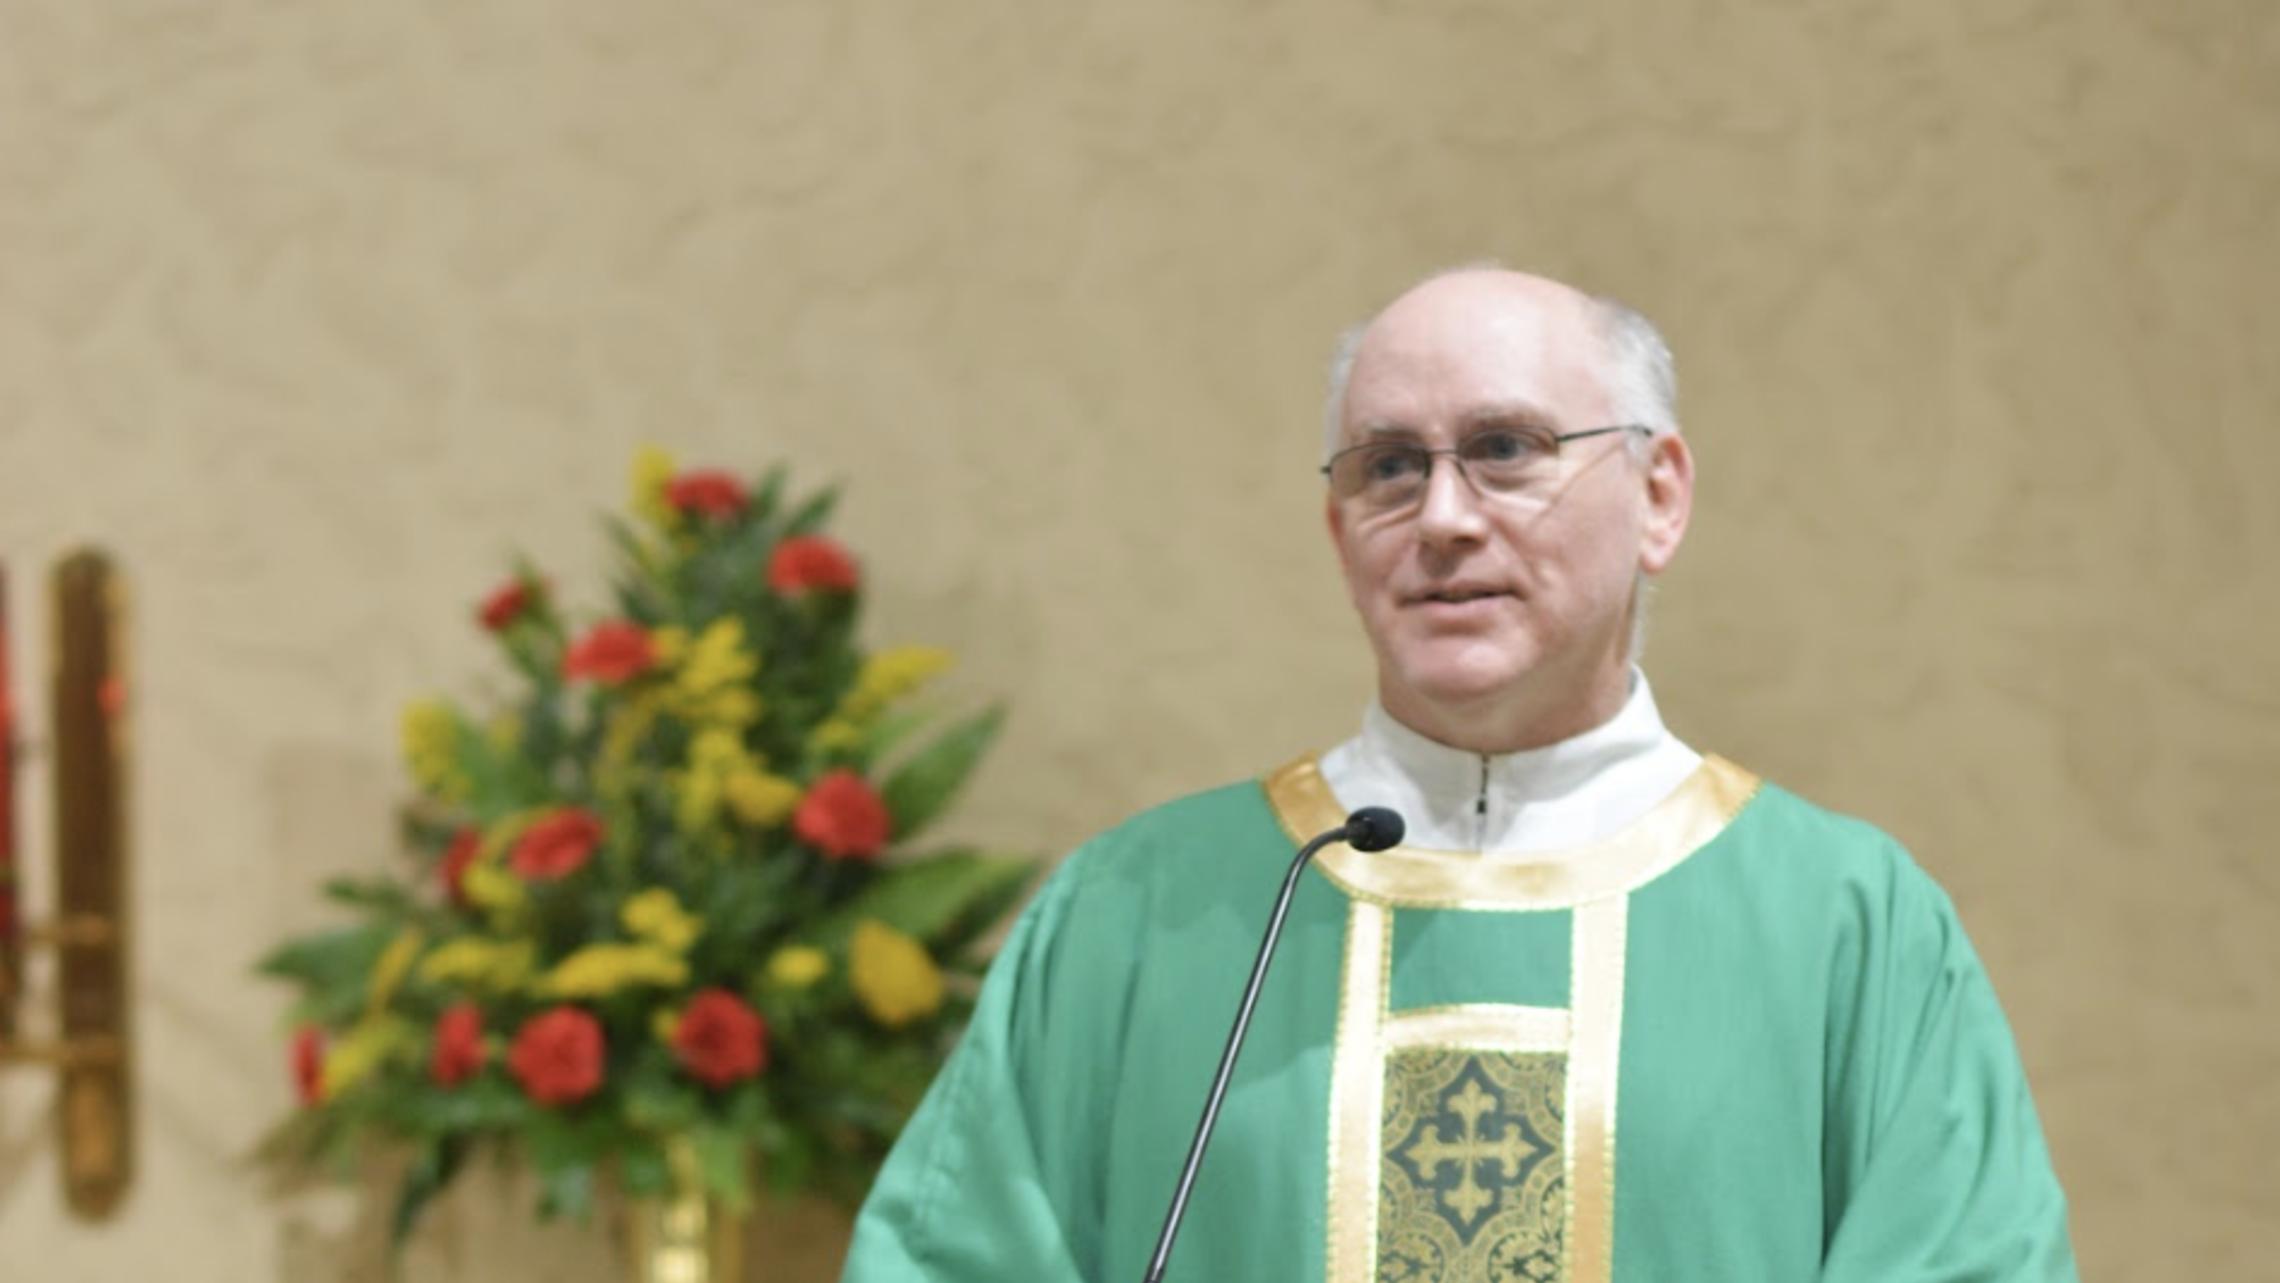 Deacon Tim Papa Homily